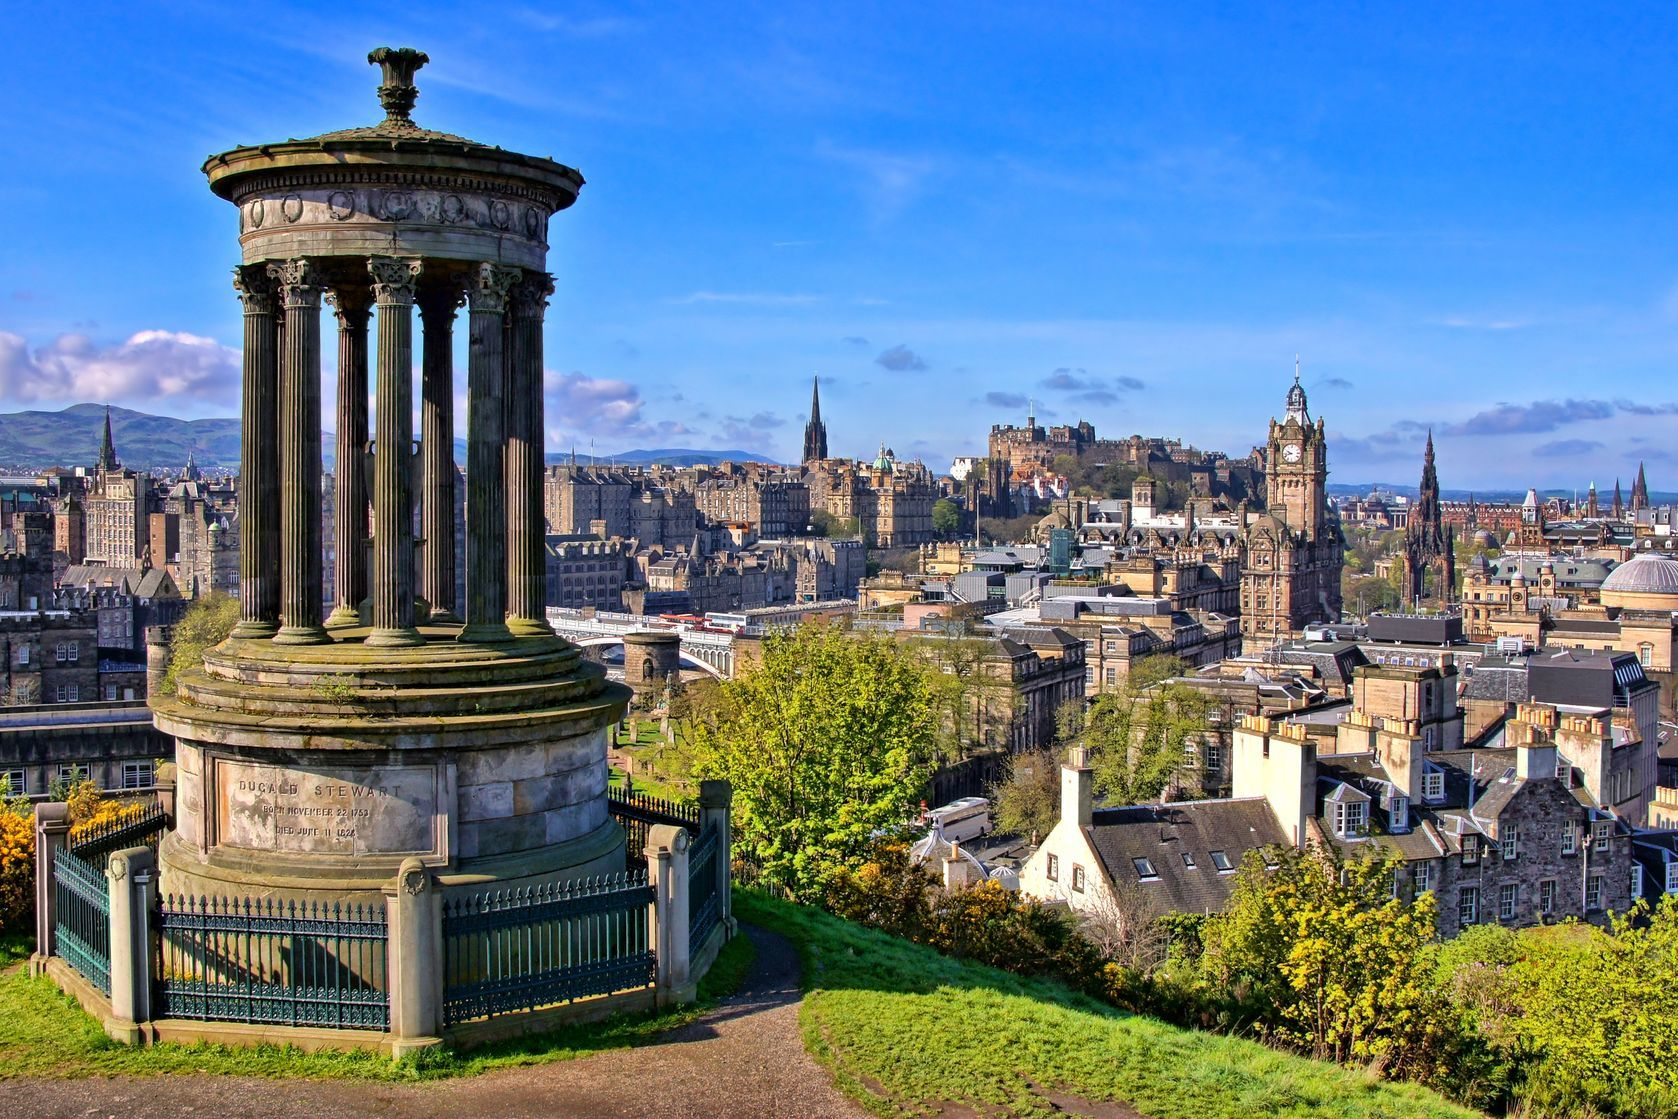 Letecký pohled na historické centrum Edinburghu | jenifoto/123RF.com